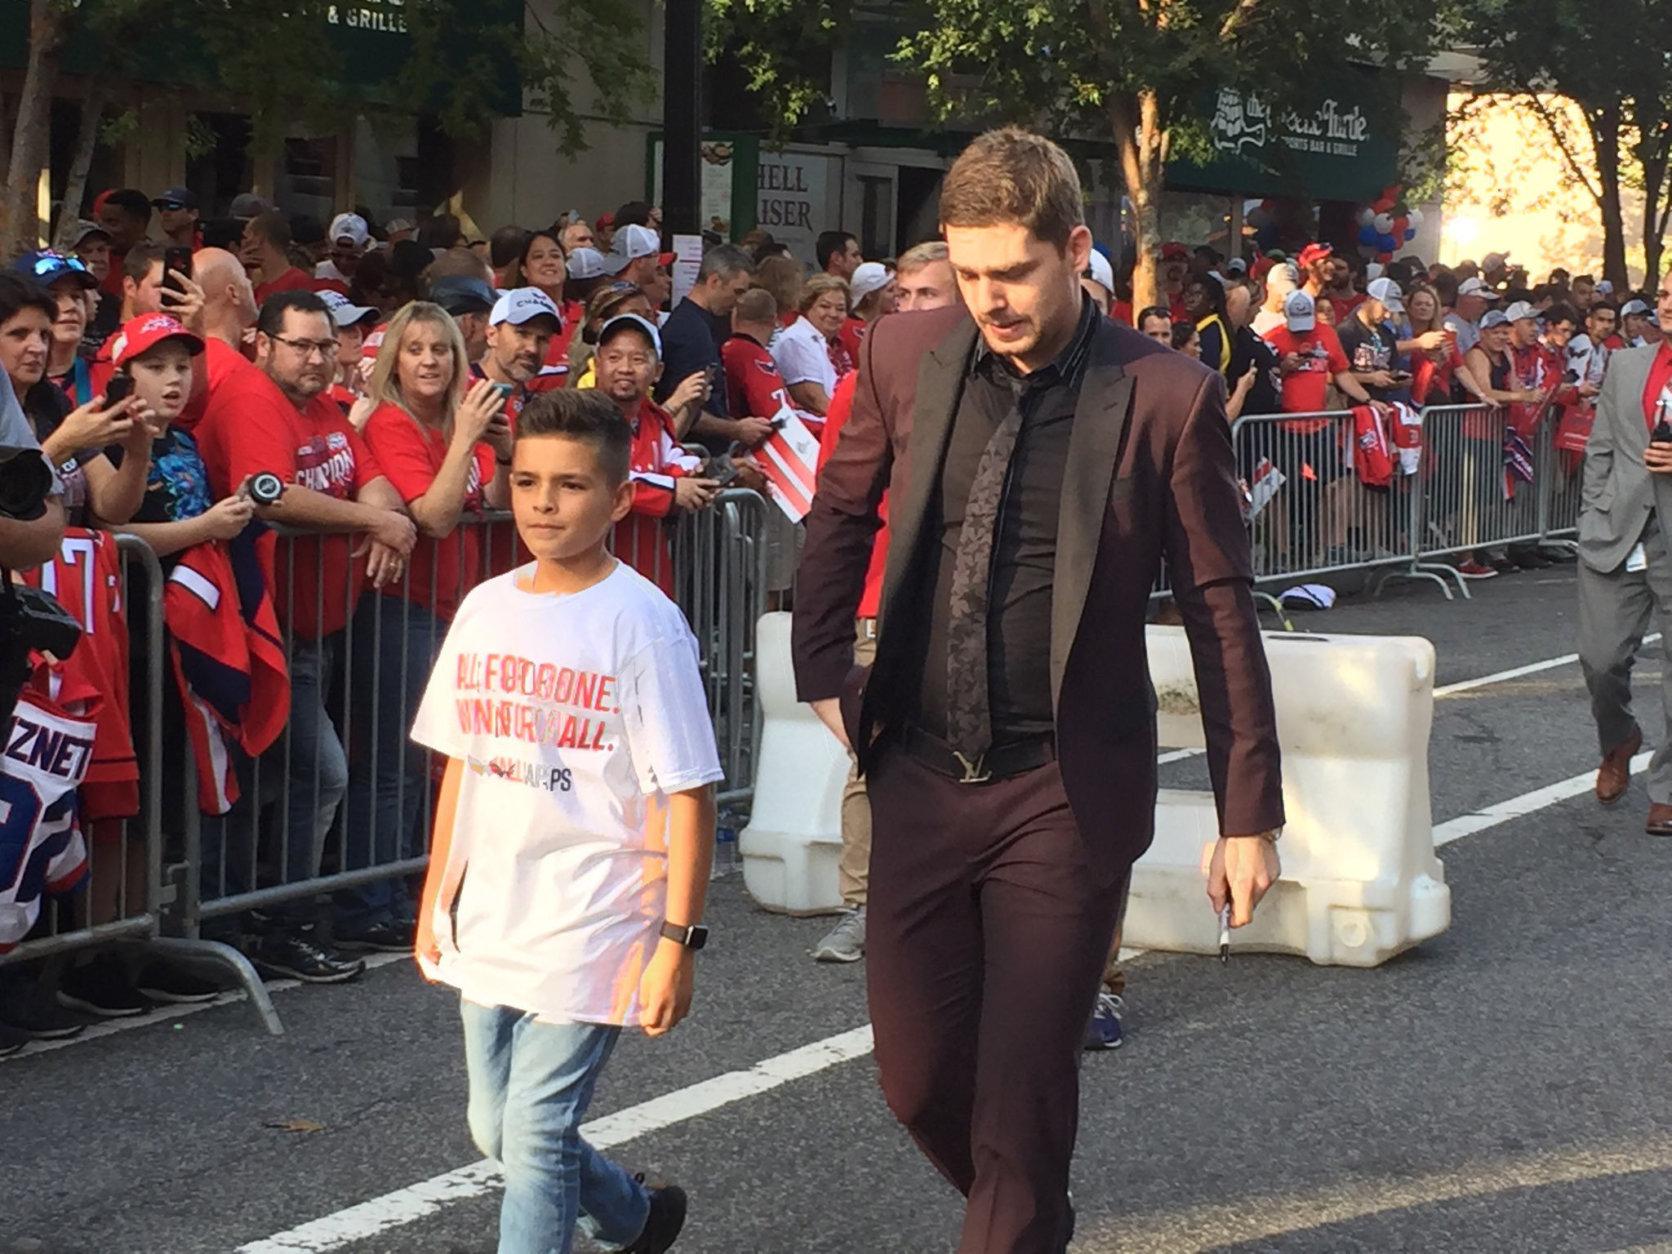 The Capitals' Evgeny Kuznetsov arrives at the 2018-2019 season opener. (WTOP/Jonathan Warner)